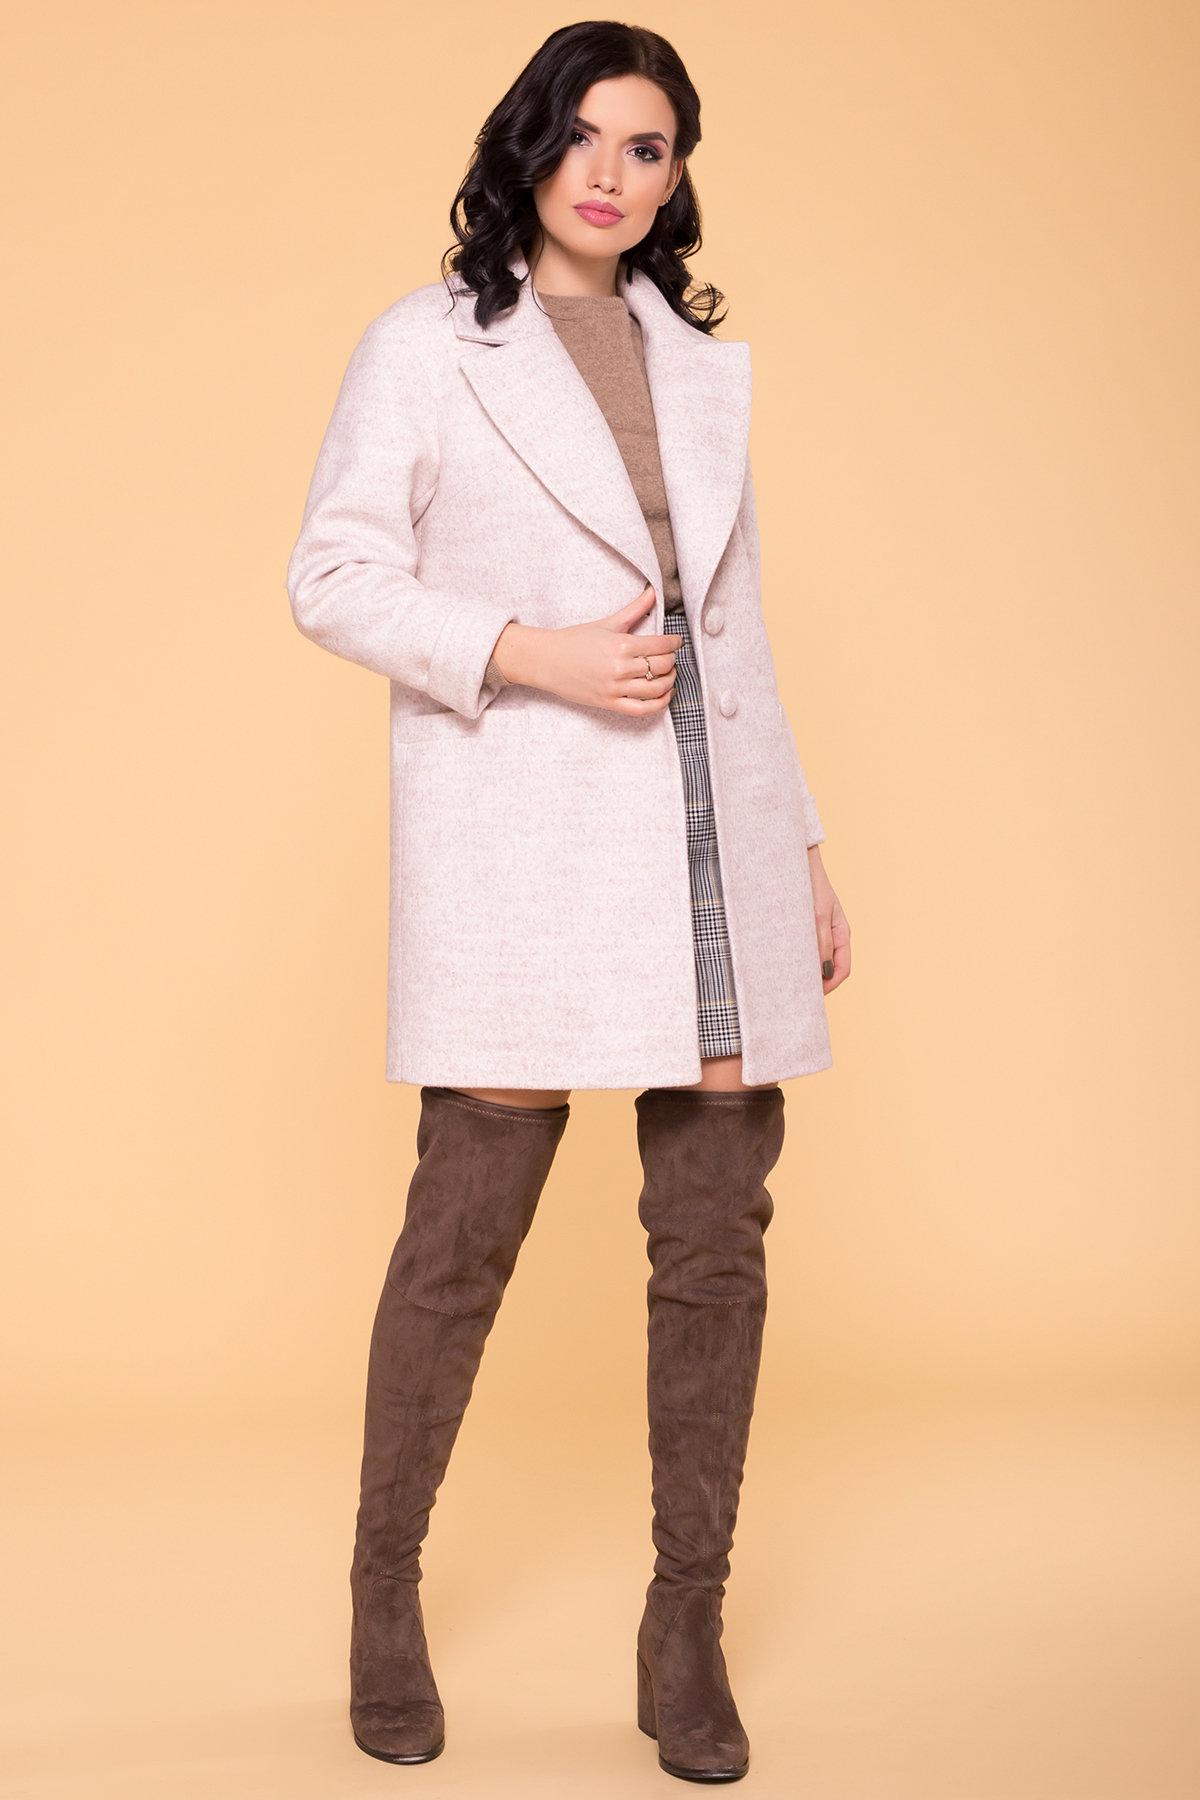 Пальто Вива 4558 АРТ. 21904 Цвет: Бежевый 21 - фото 3, интернет магазин tm-modus.ru